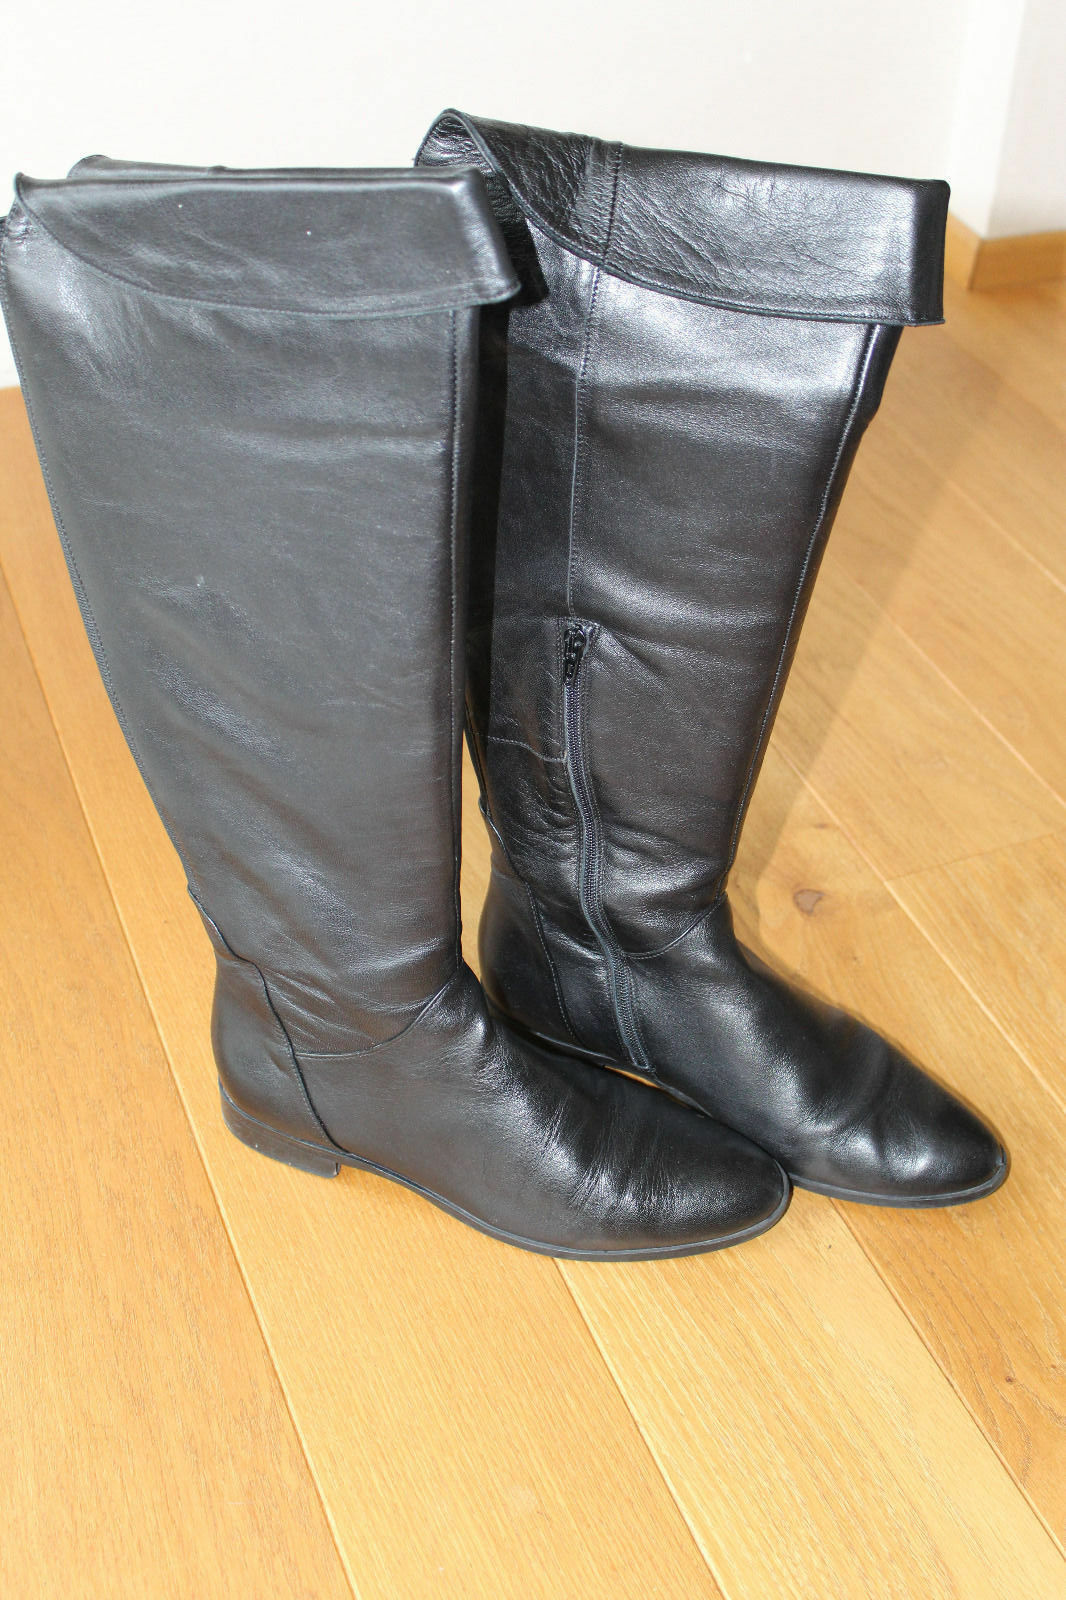 Stiefel  wie Görtz Gr. 40, wie  neu 5c356a